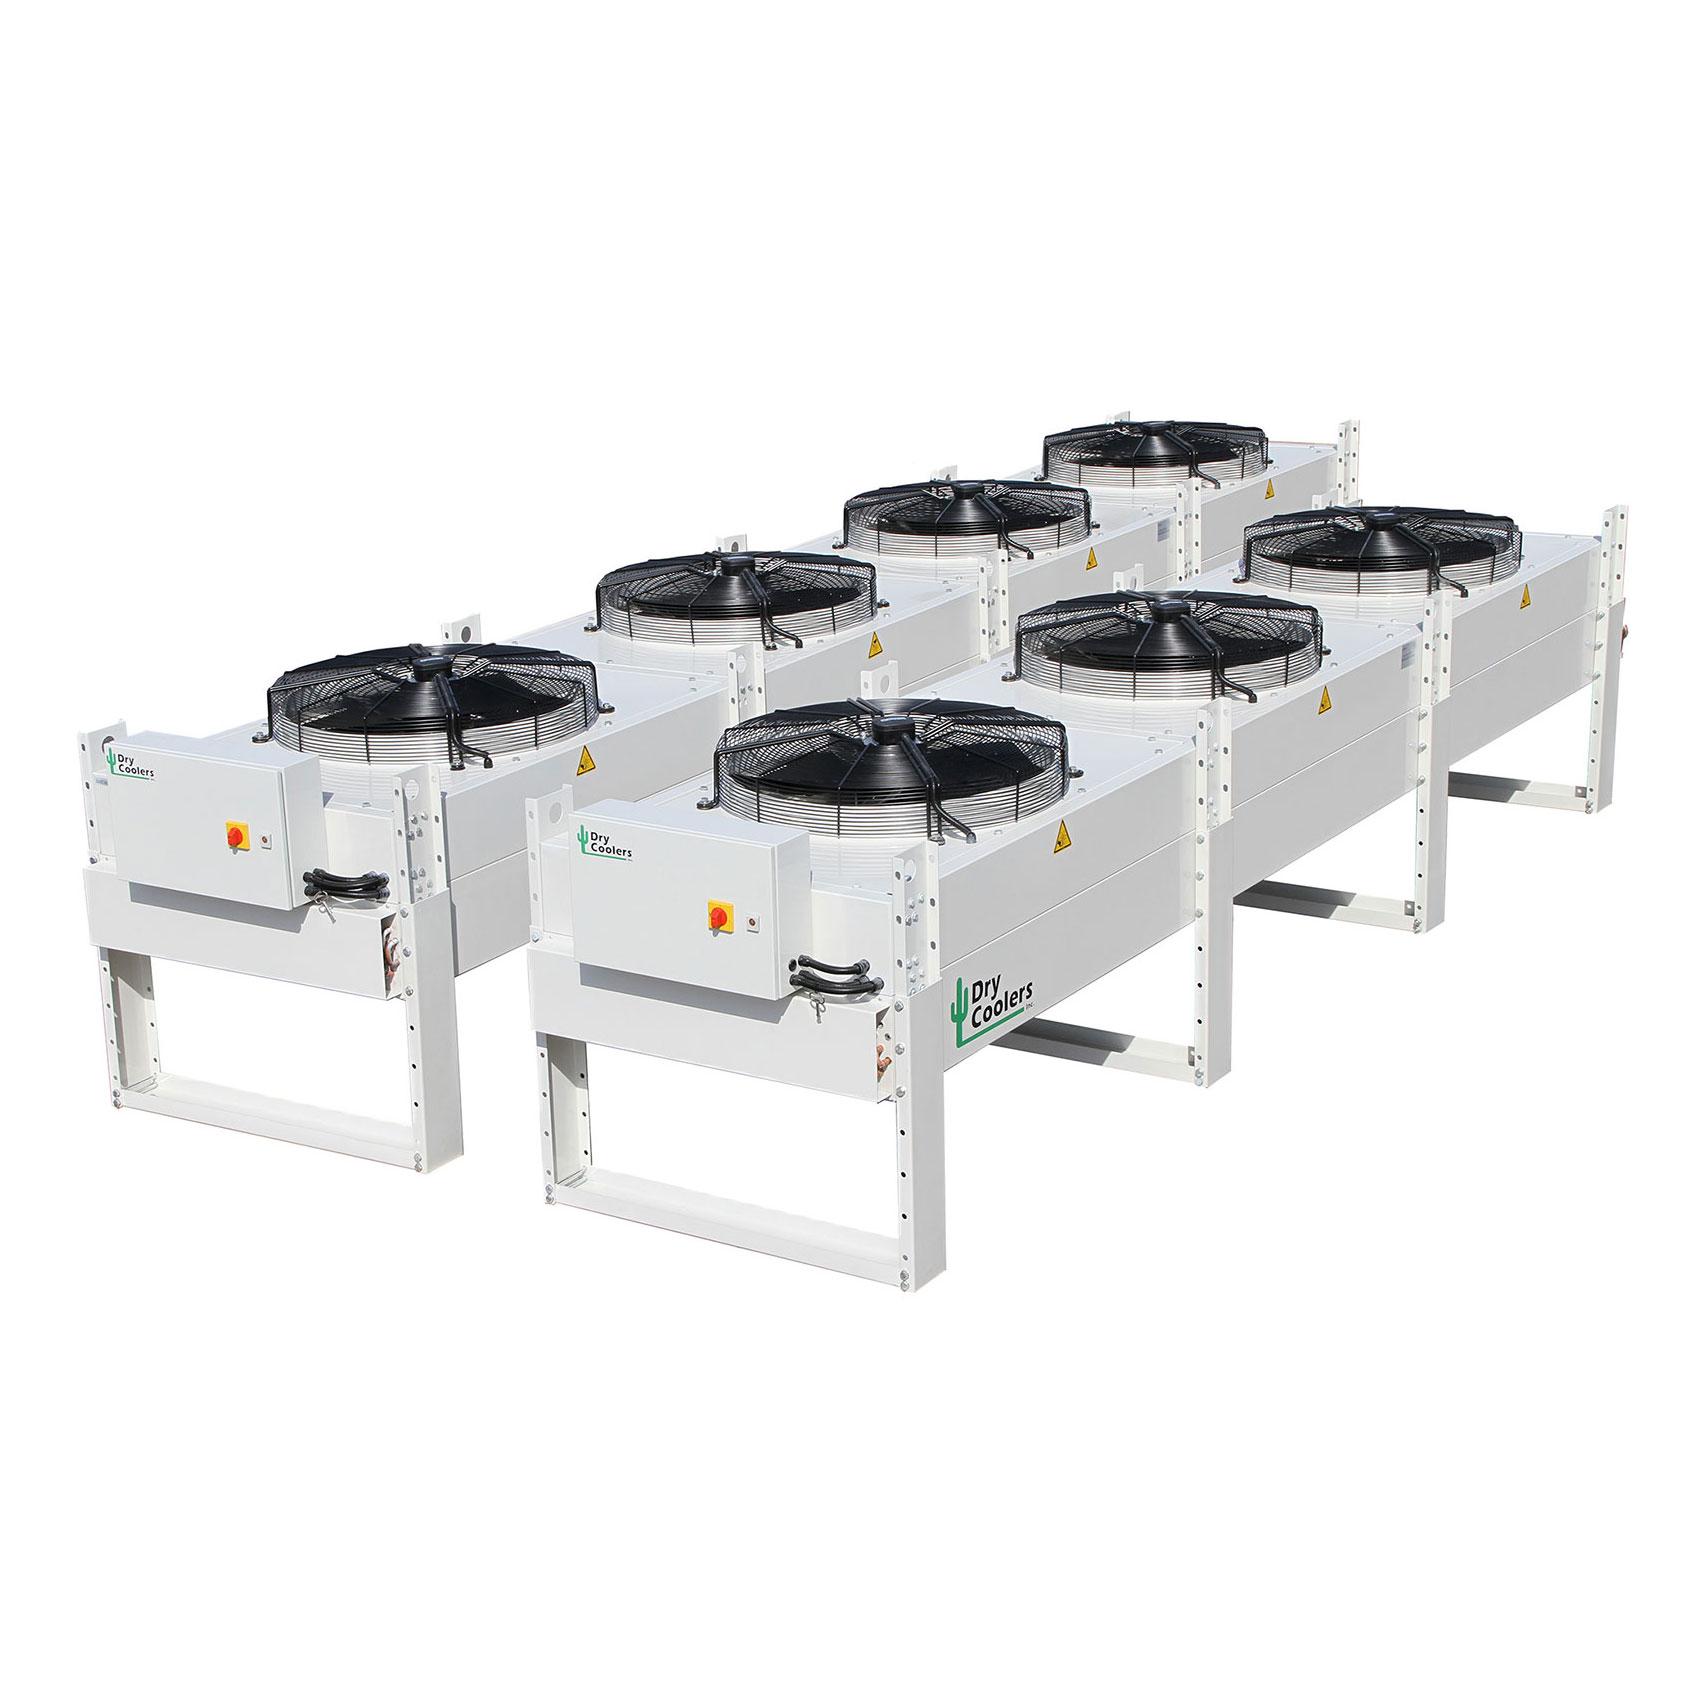 AquaVent AVI Air-Cooled Heat Exchanger